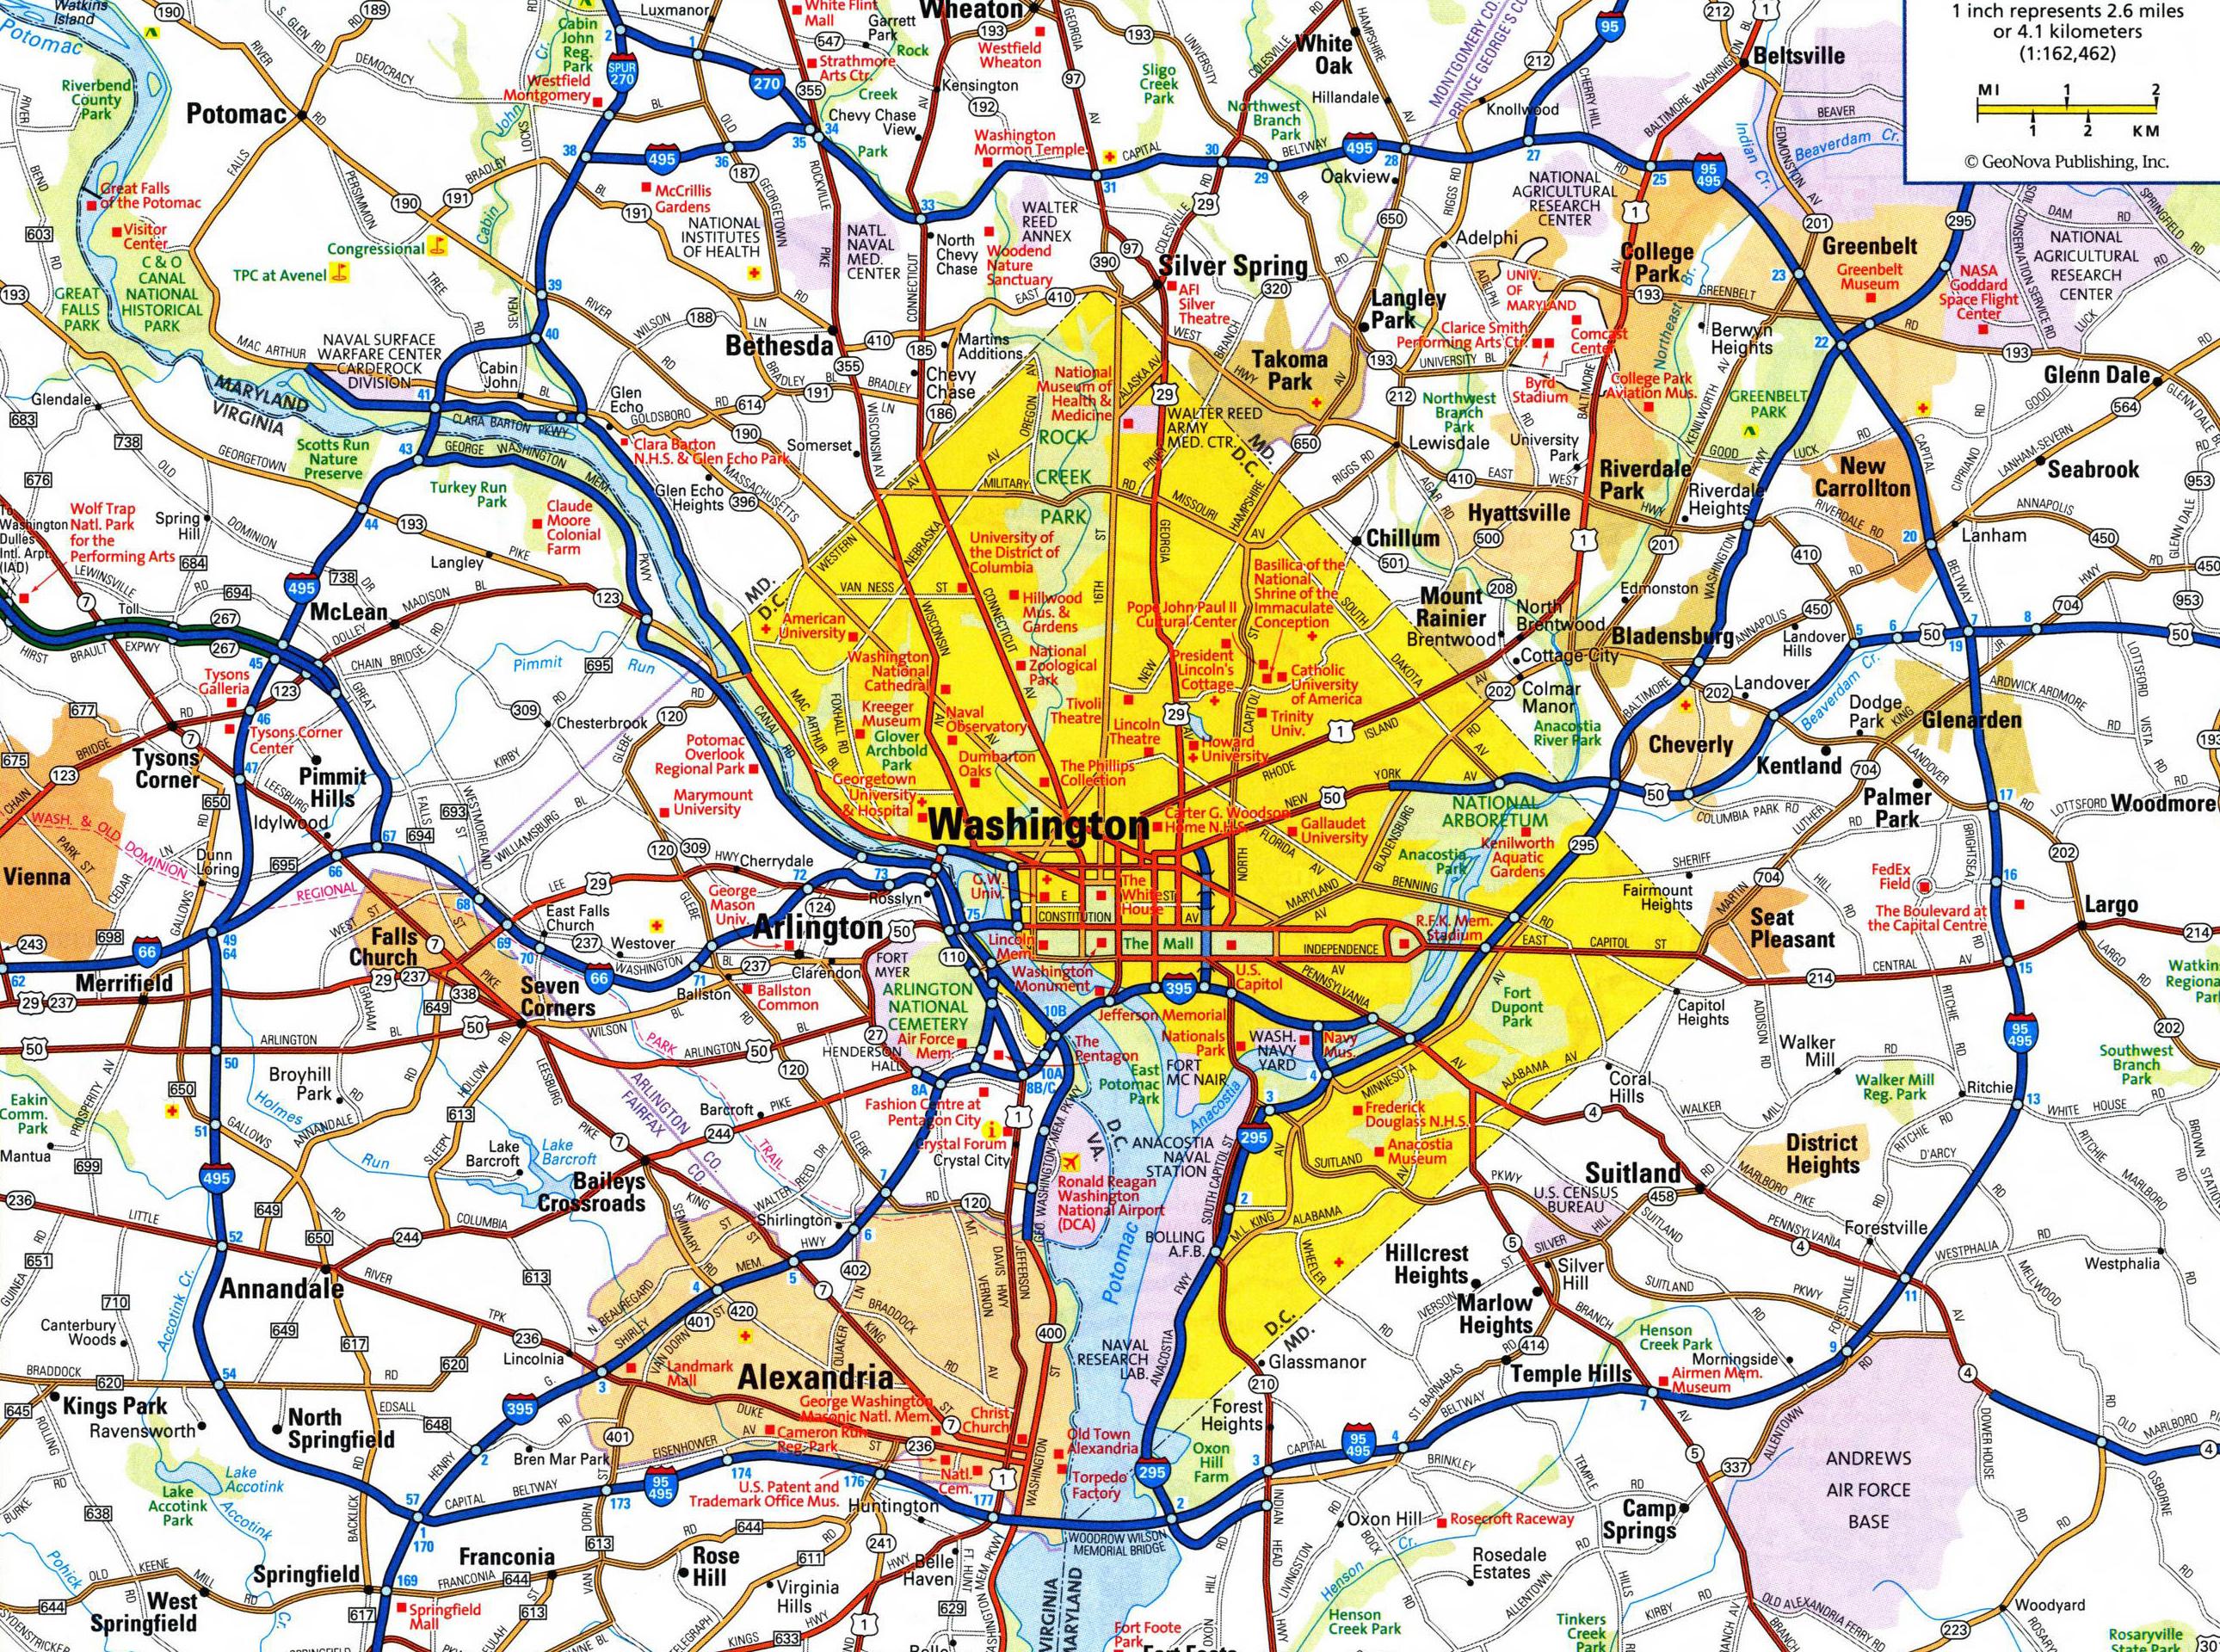 Map Of Washington Dc Area Large detailed roads and highways map of Washington D.C. area  Map Of Washington Dc Area